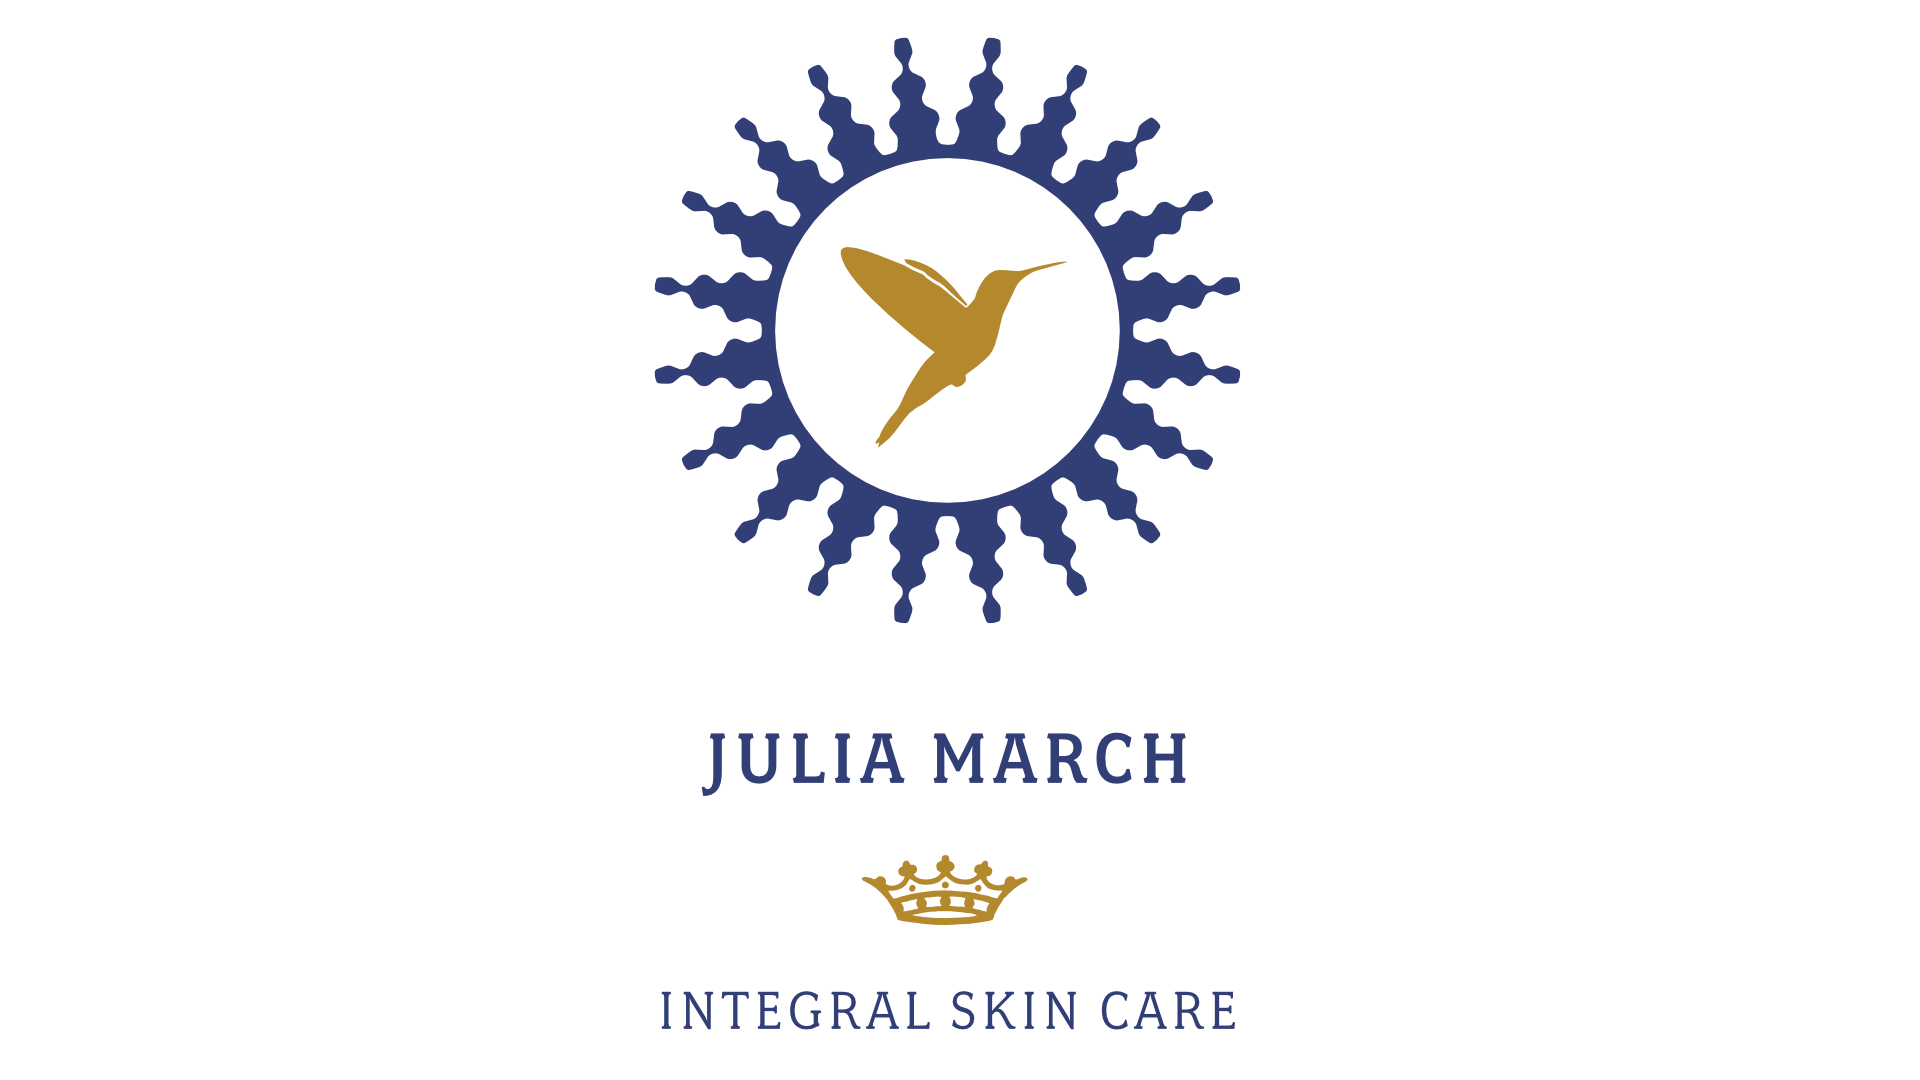 Julia March Integral Skin Care